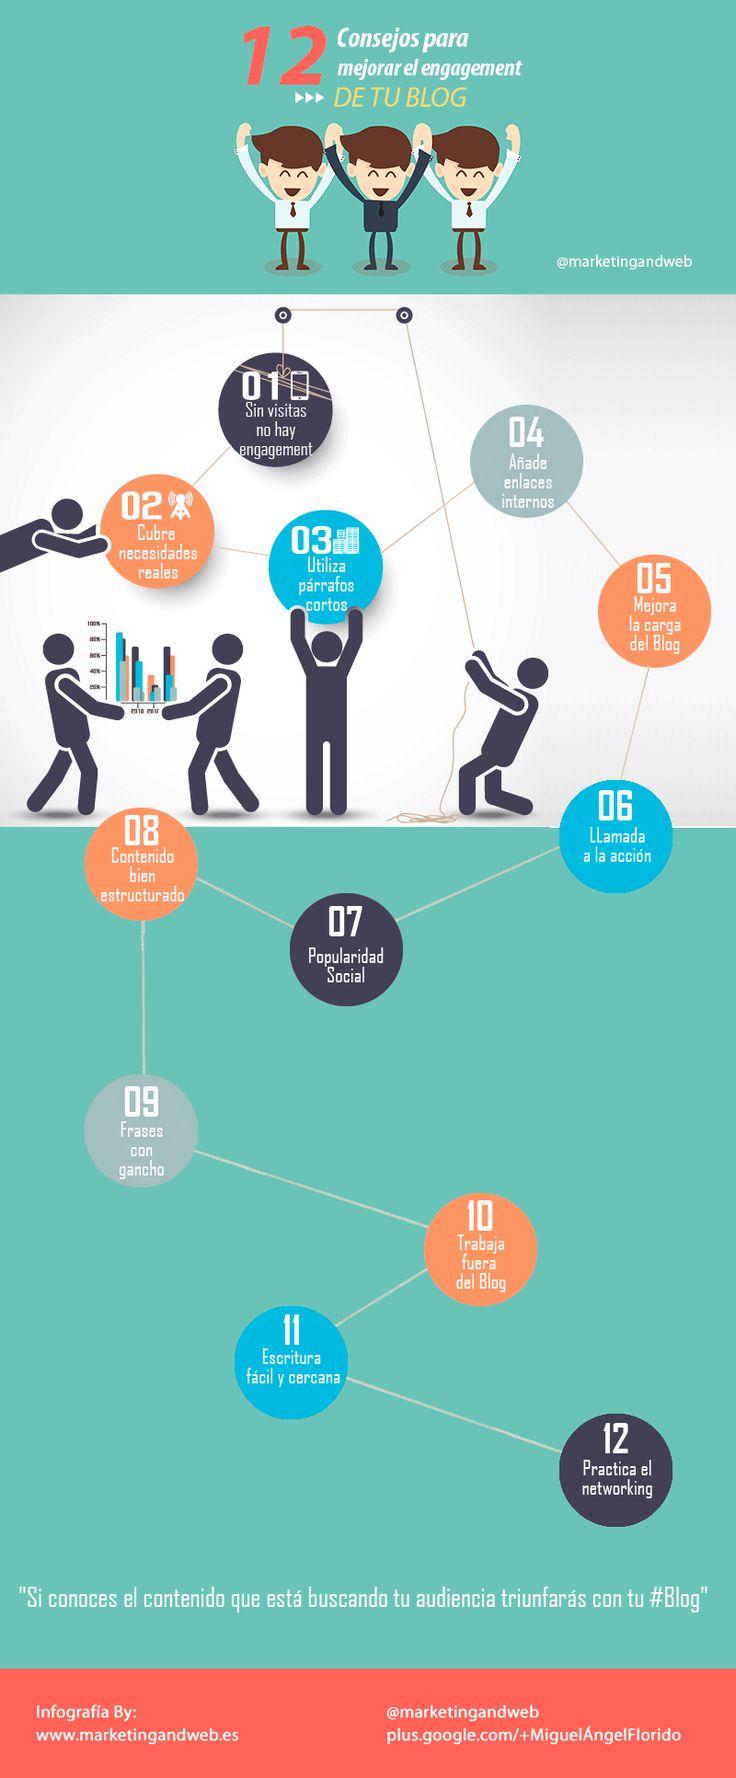 12 Consejos para mejorar el engagement en un Blog. #infografia #marketing on line #socialmedia follow @pyra2elcapo